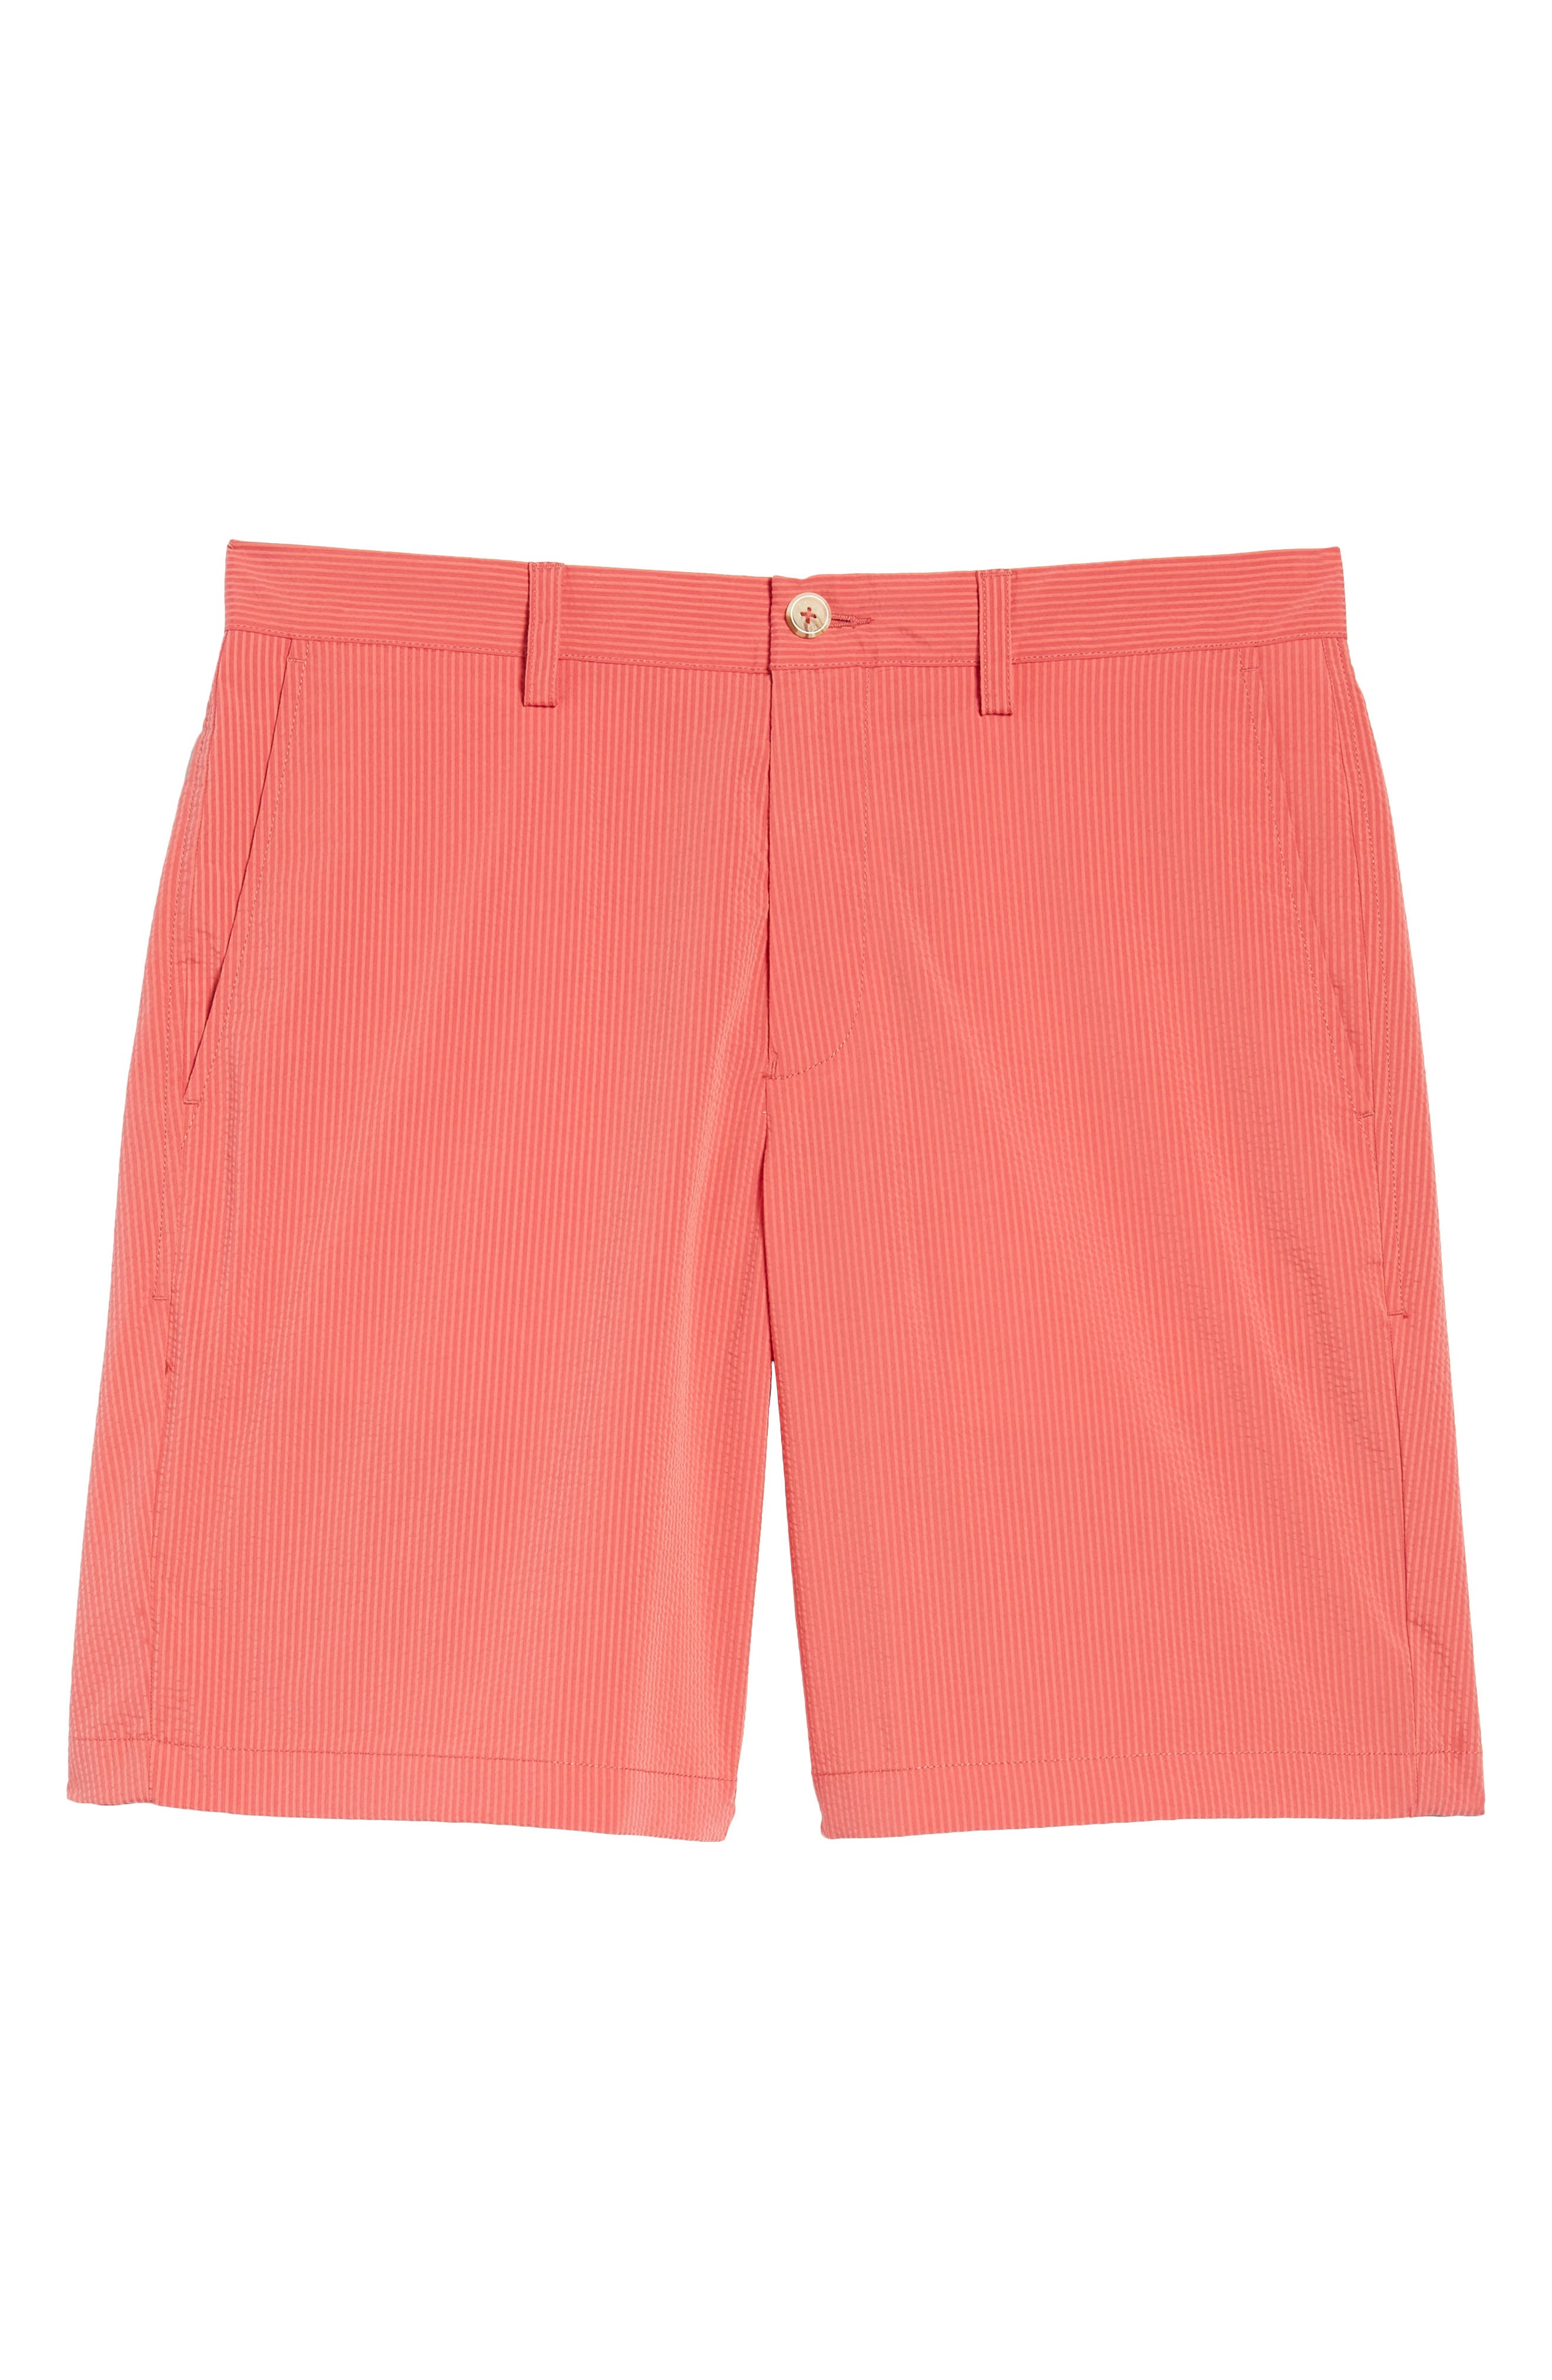 Seersucker Shorts,                             Alternate thumbnail 12, color,